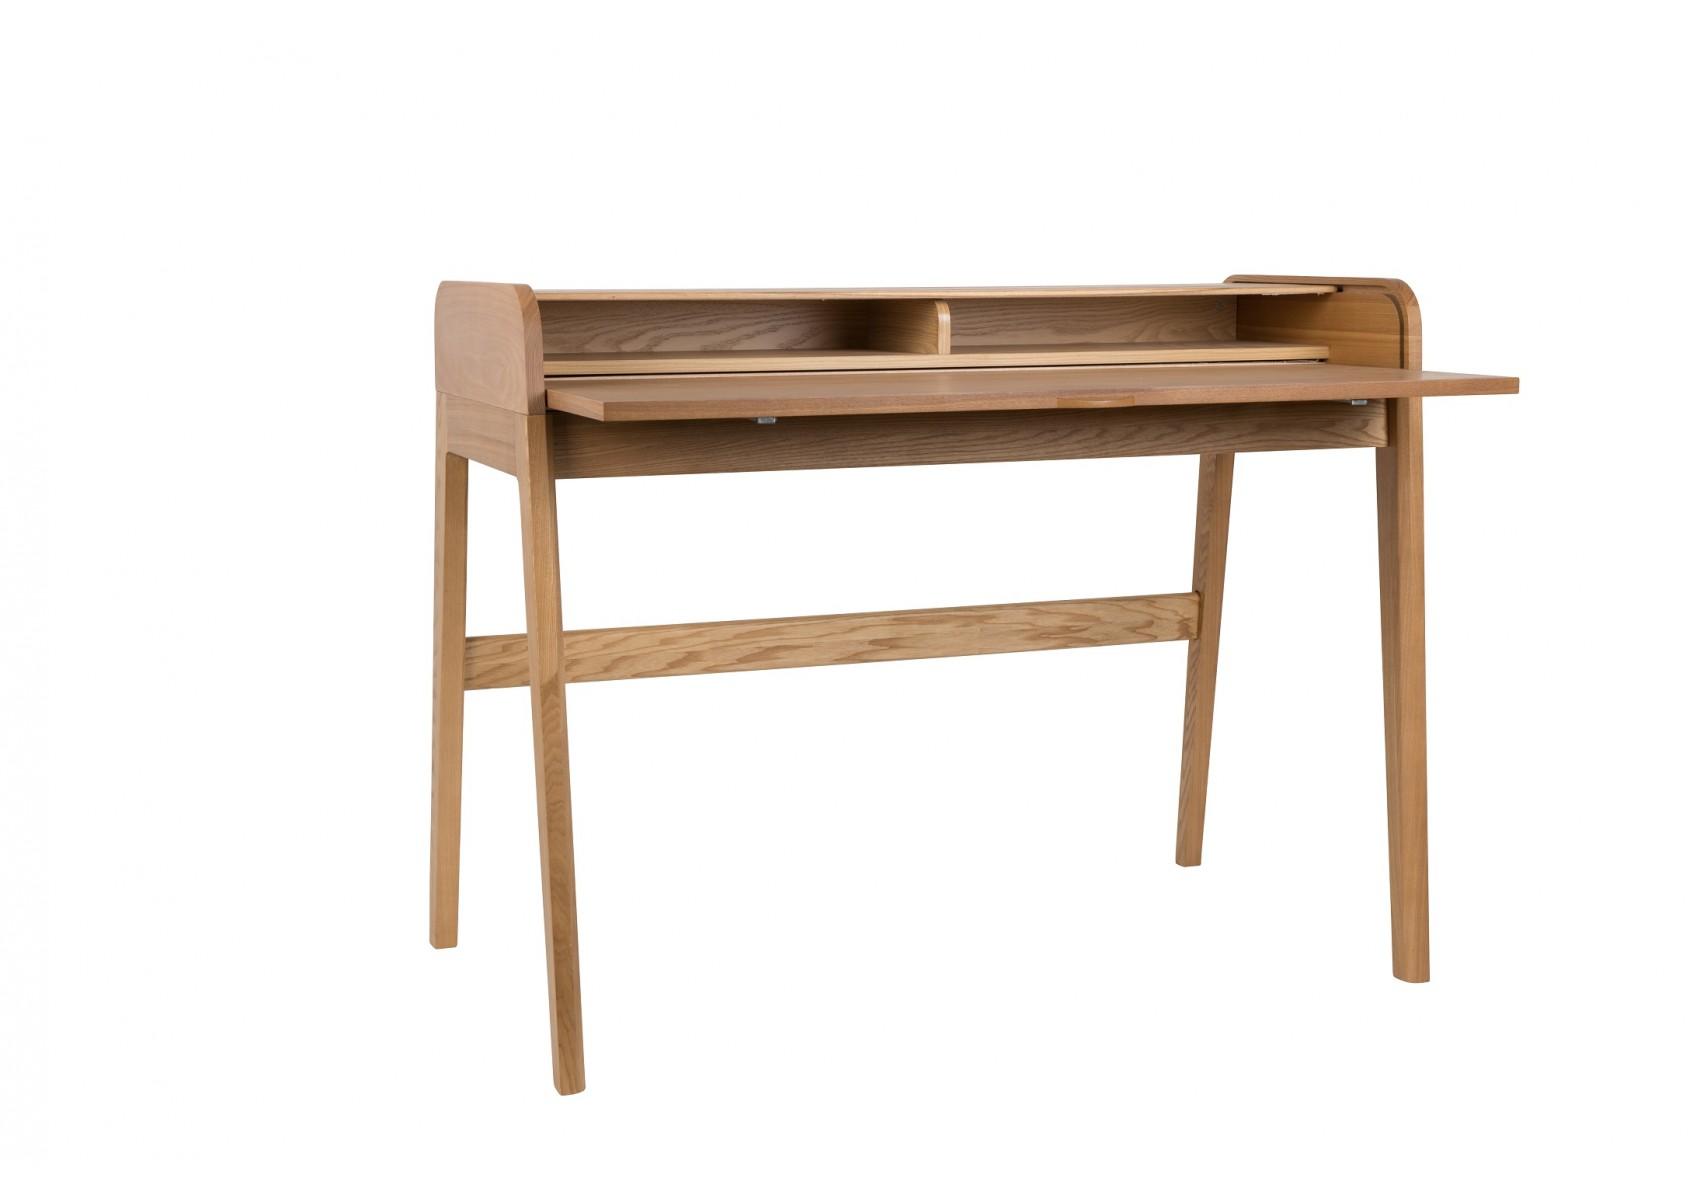 bureau design barbier d co en bois par zuiver. Black Bedroom Furniture Sets. Home Design Ideas